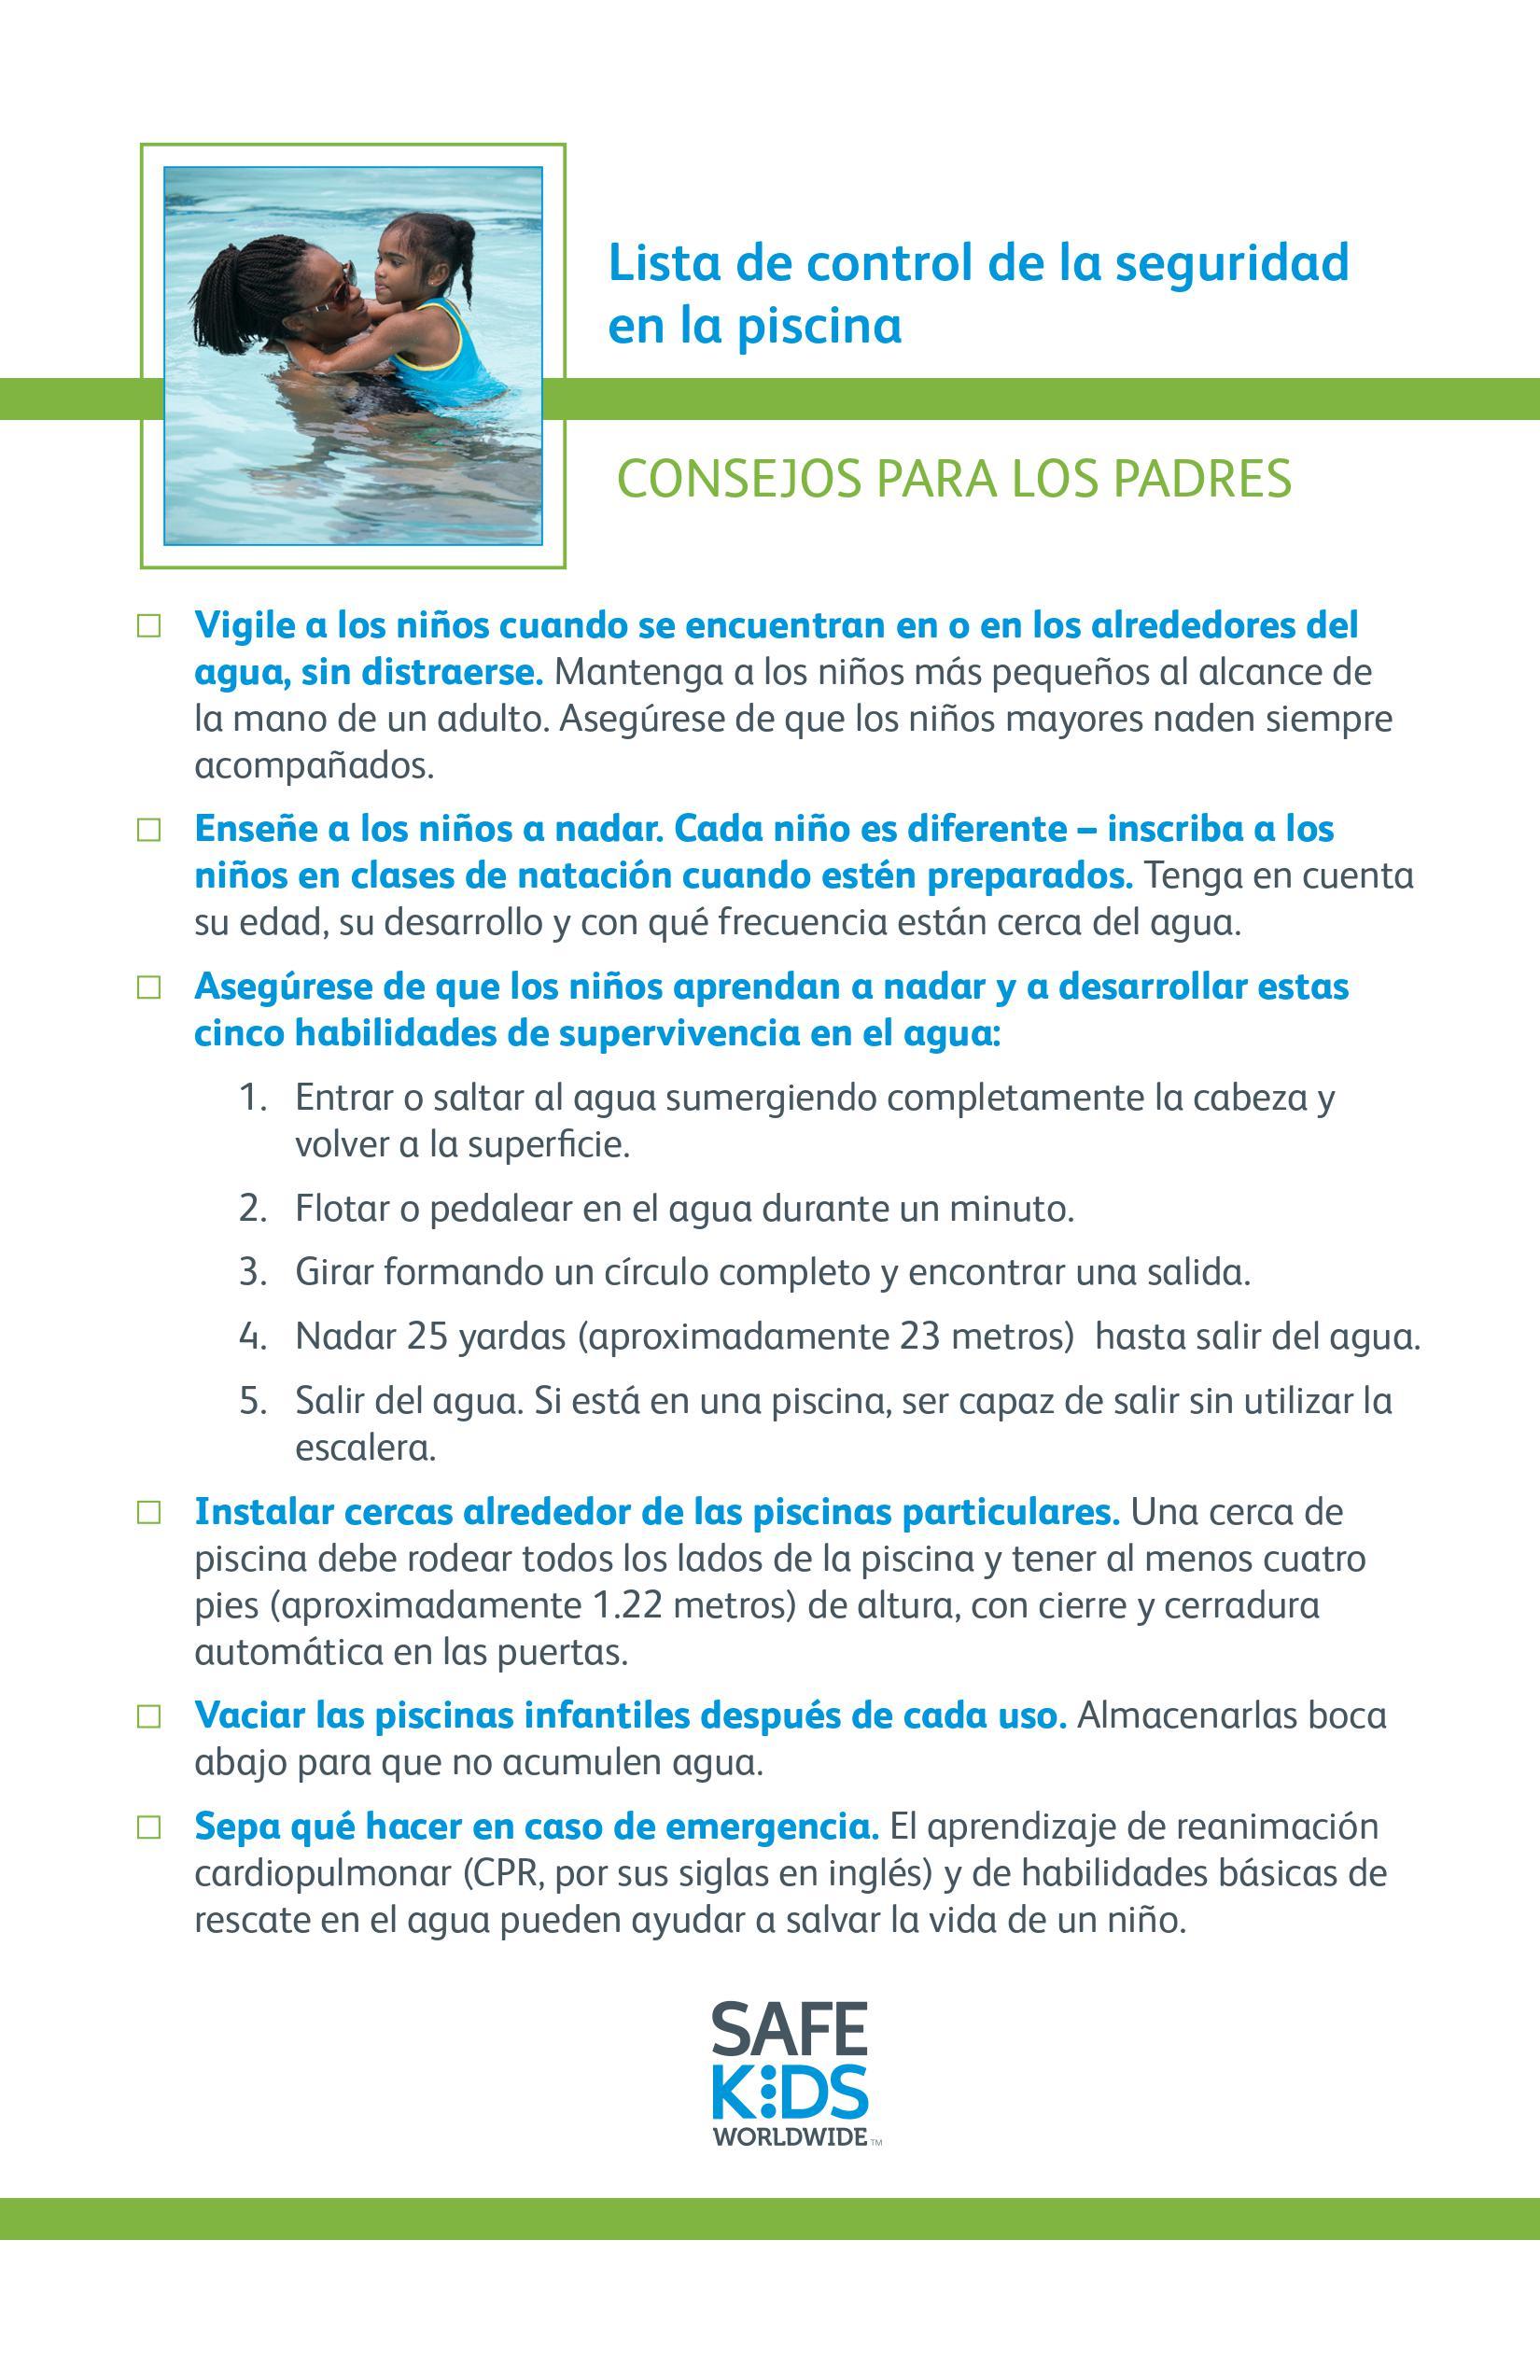 Pool Safety Checklist in Spanish